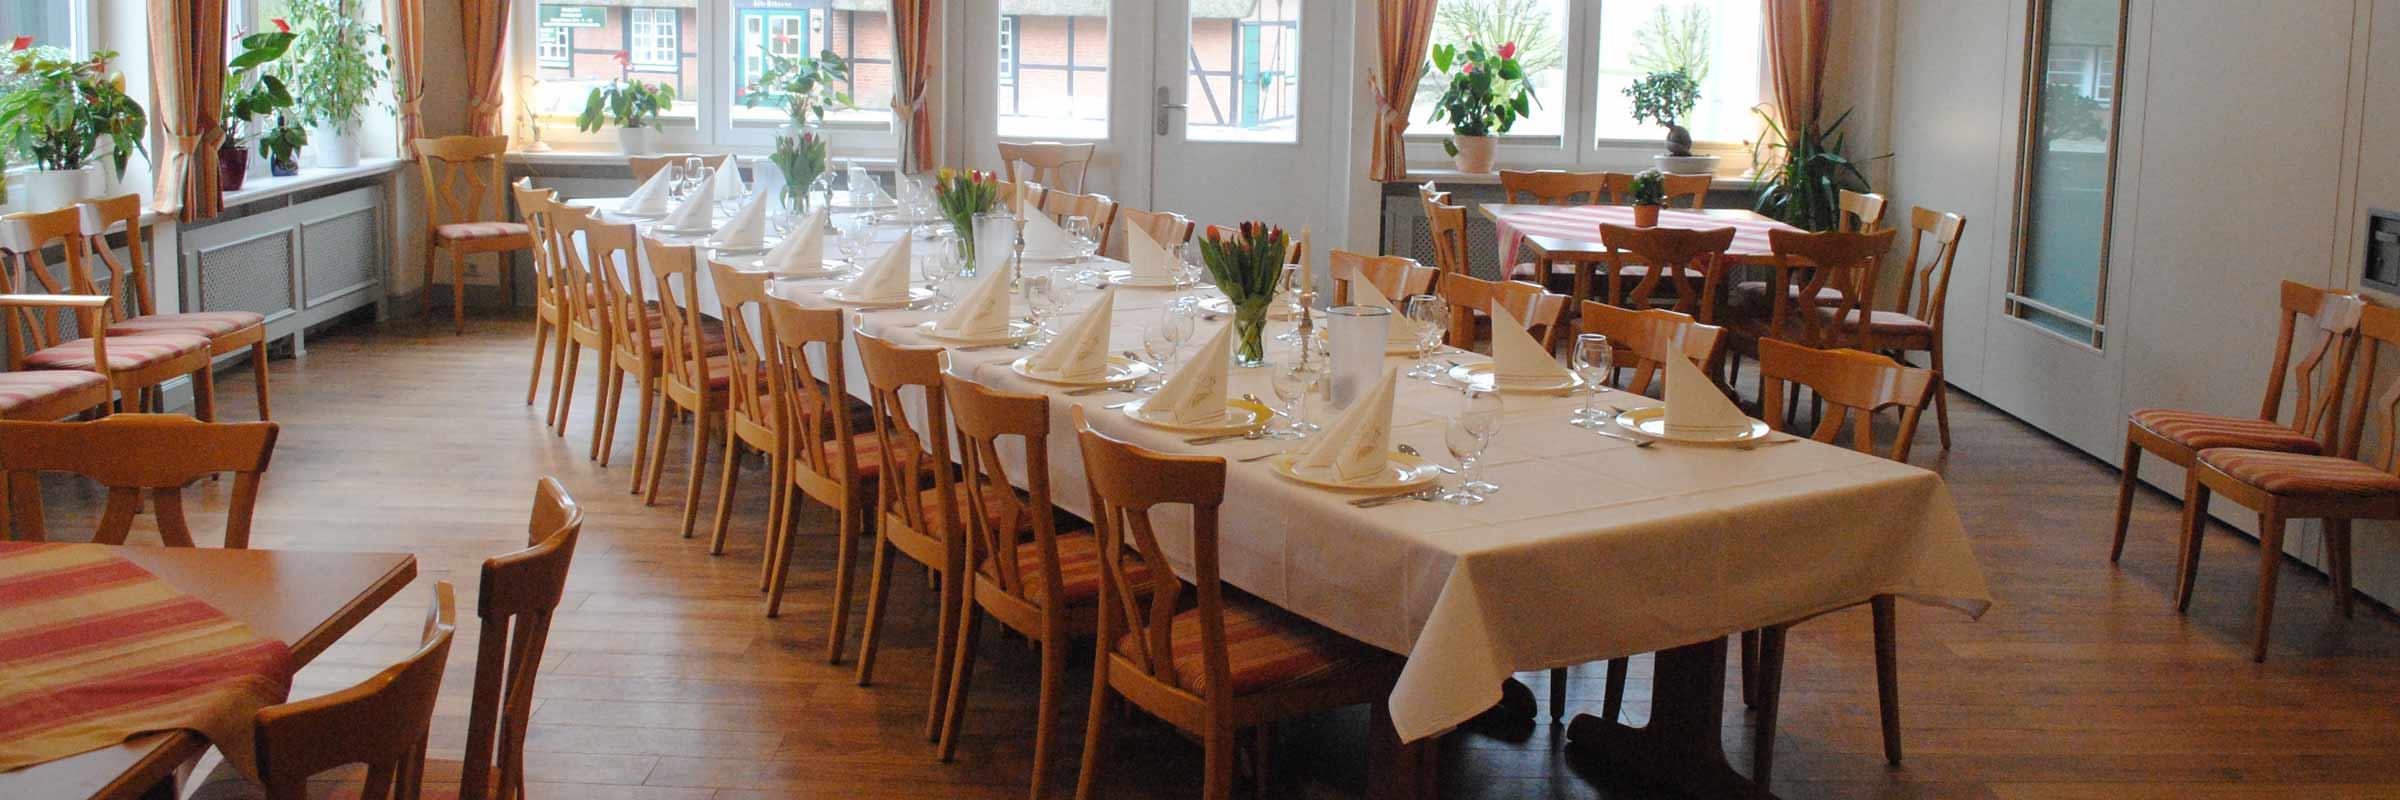 Landhotel & Restaurant Strengliner Mühle